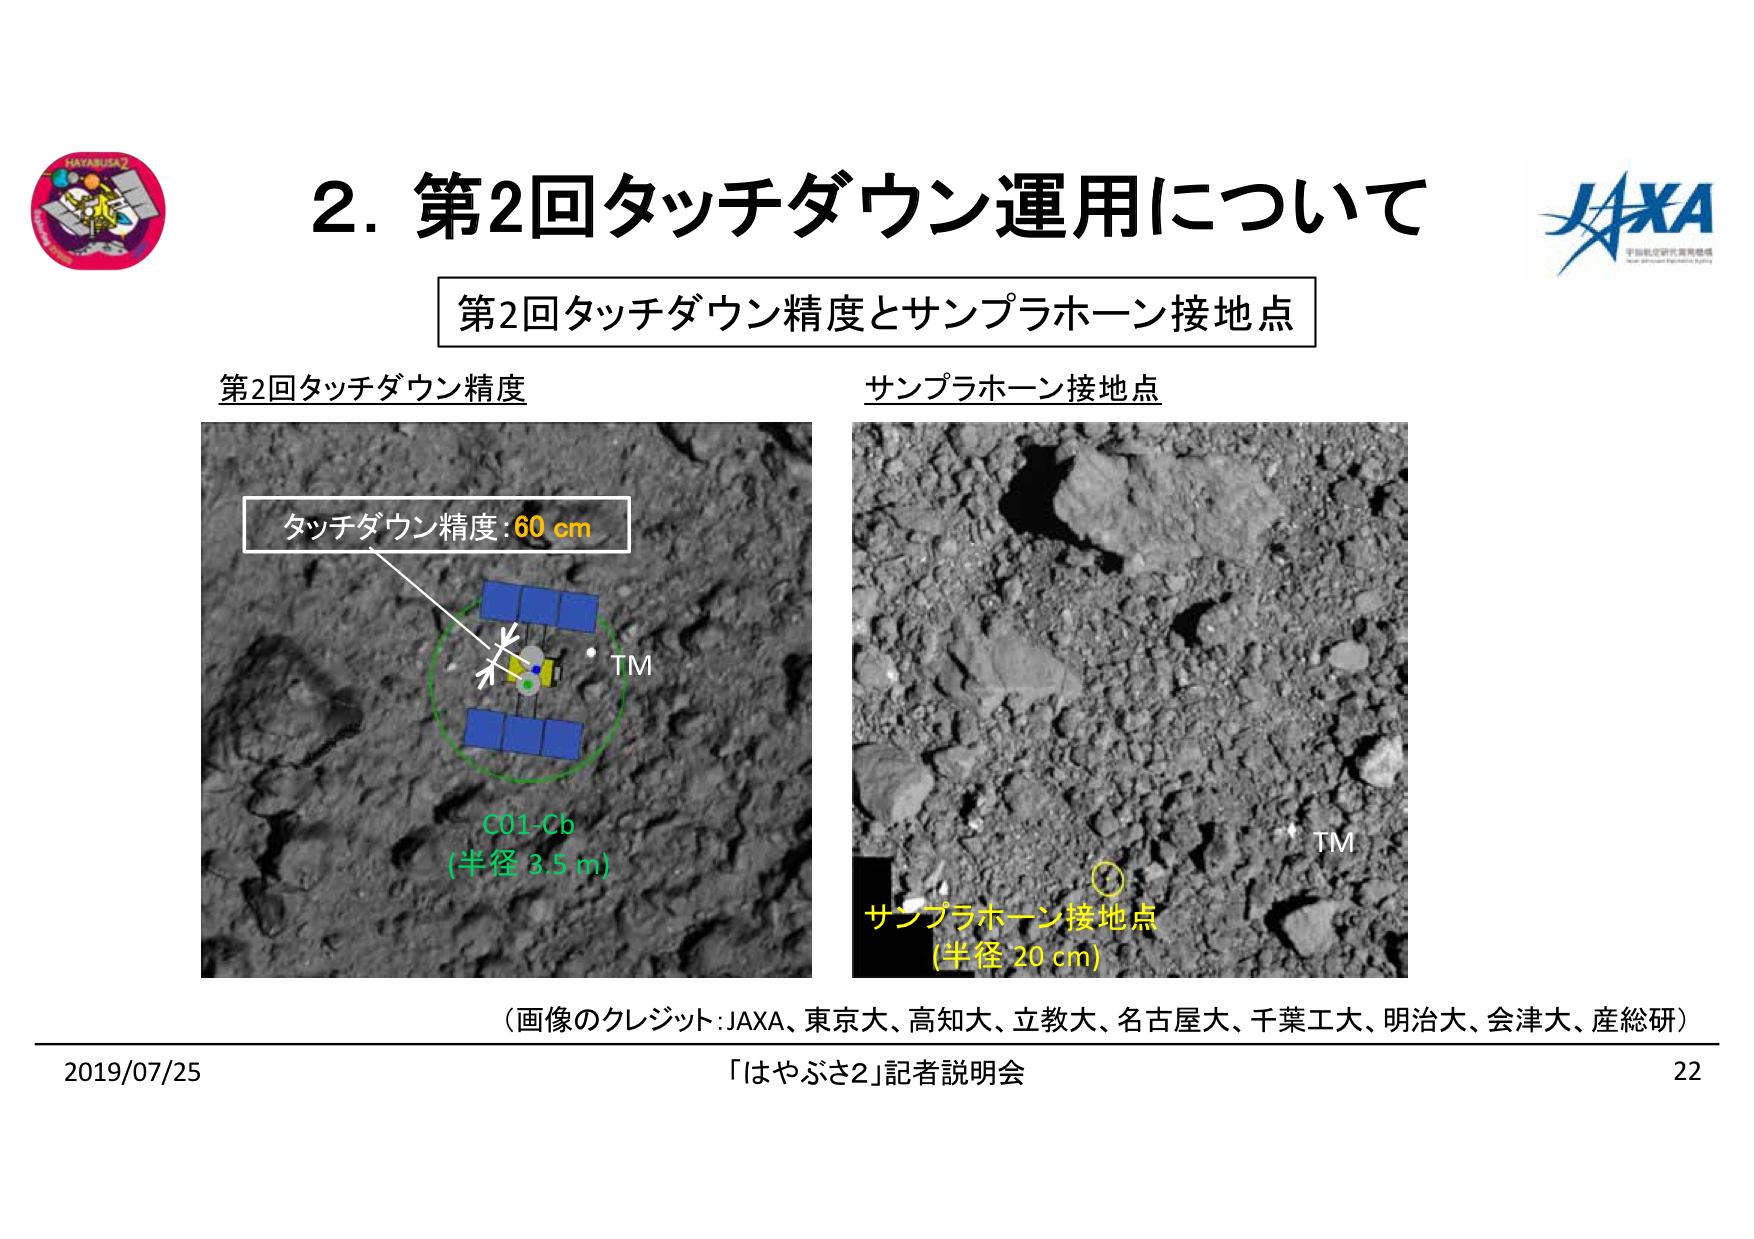 f:id:Imamura:20190725151257p:plain